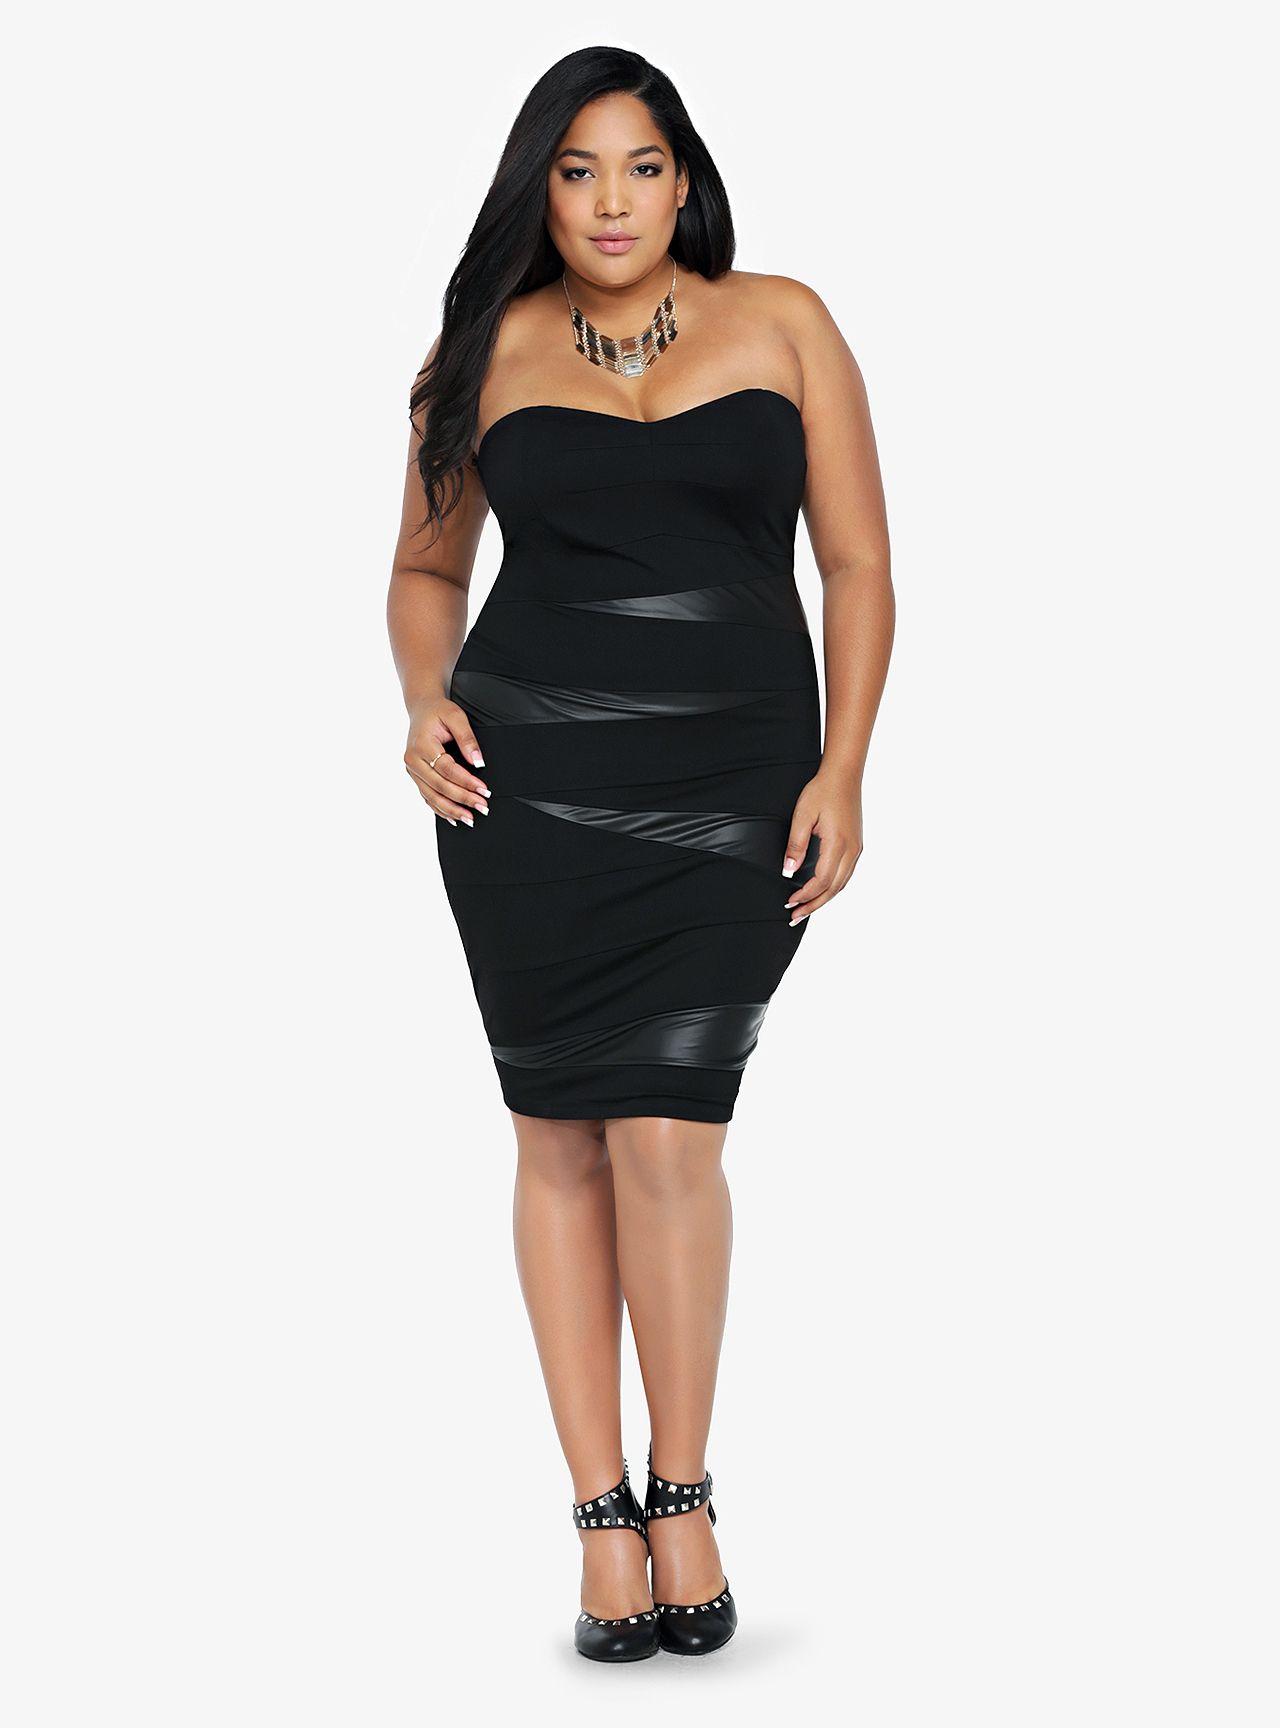 Lace dress torrid  Faux Leather Bodycon Dress Torrid   the look  Pinterest